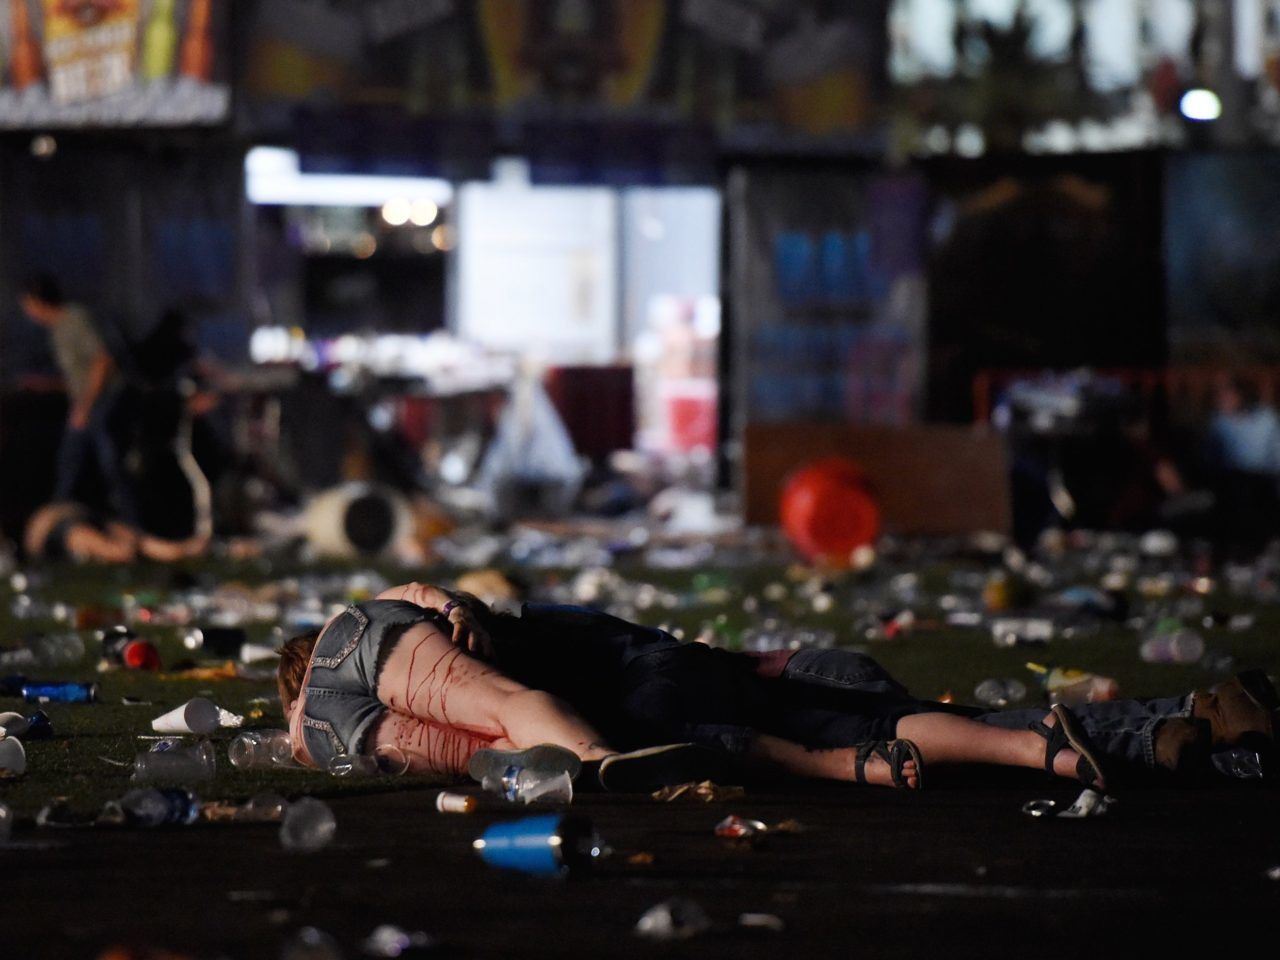 BBC - Las Vegas shooting: At least 59 dead at Mandalay Bay Hotel